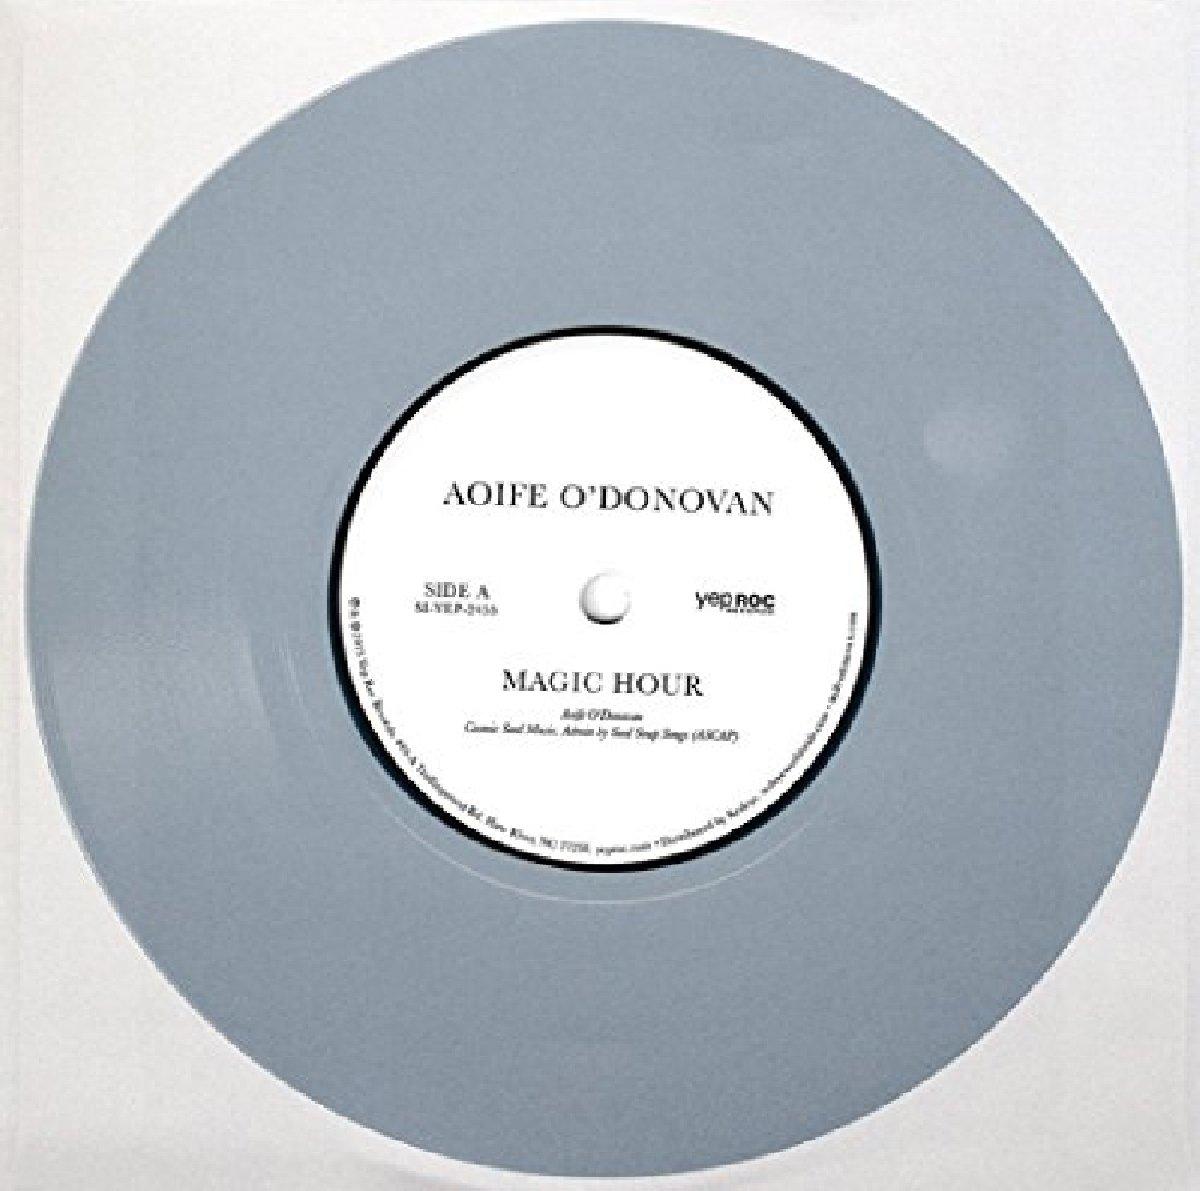 Vinilo : Aoife O'Donovan - Magic Hour (Colored Vinyl)